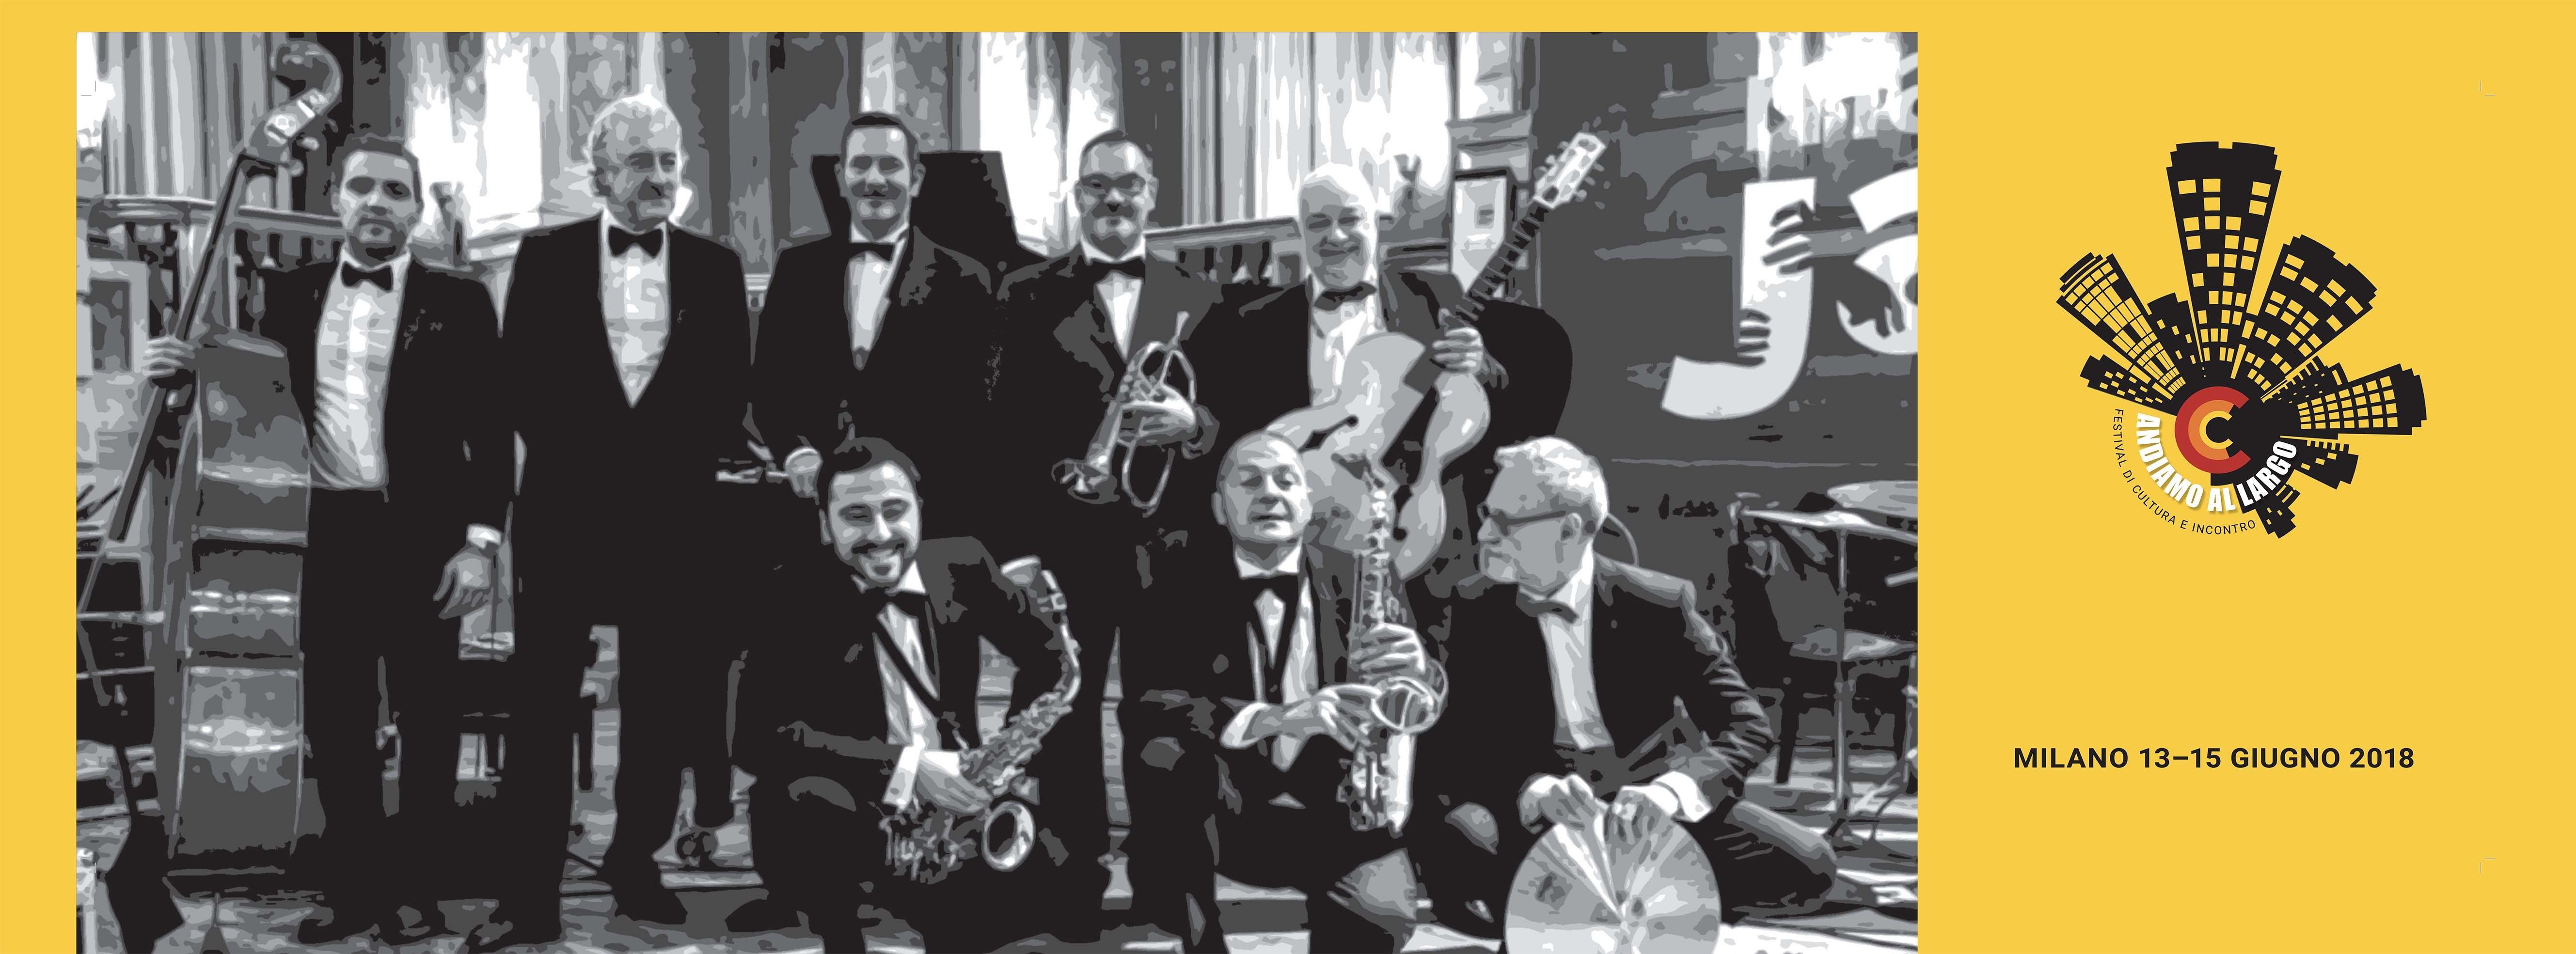 Hot jazz orchestra formato 125x40_tipo B14